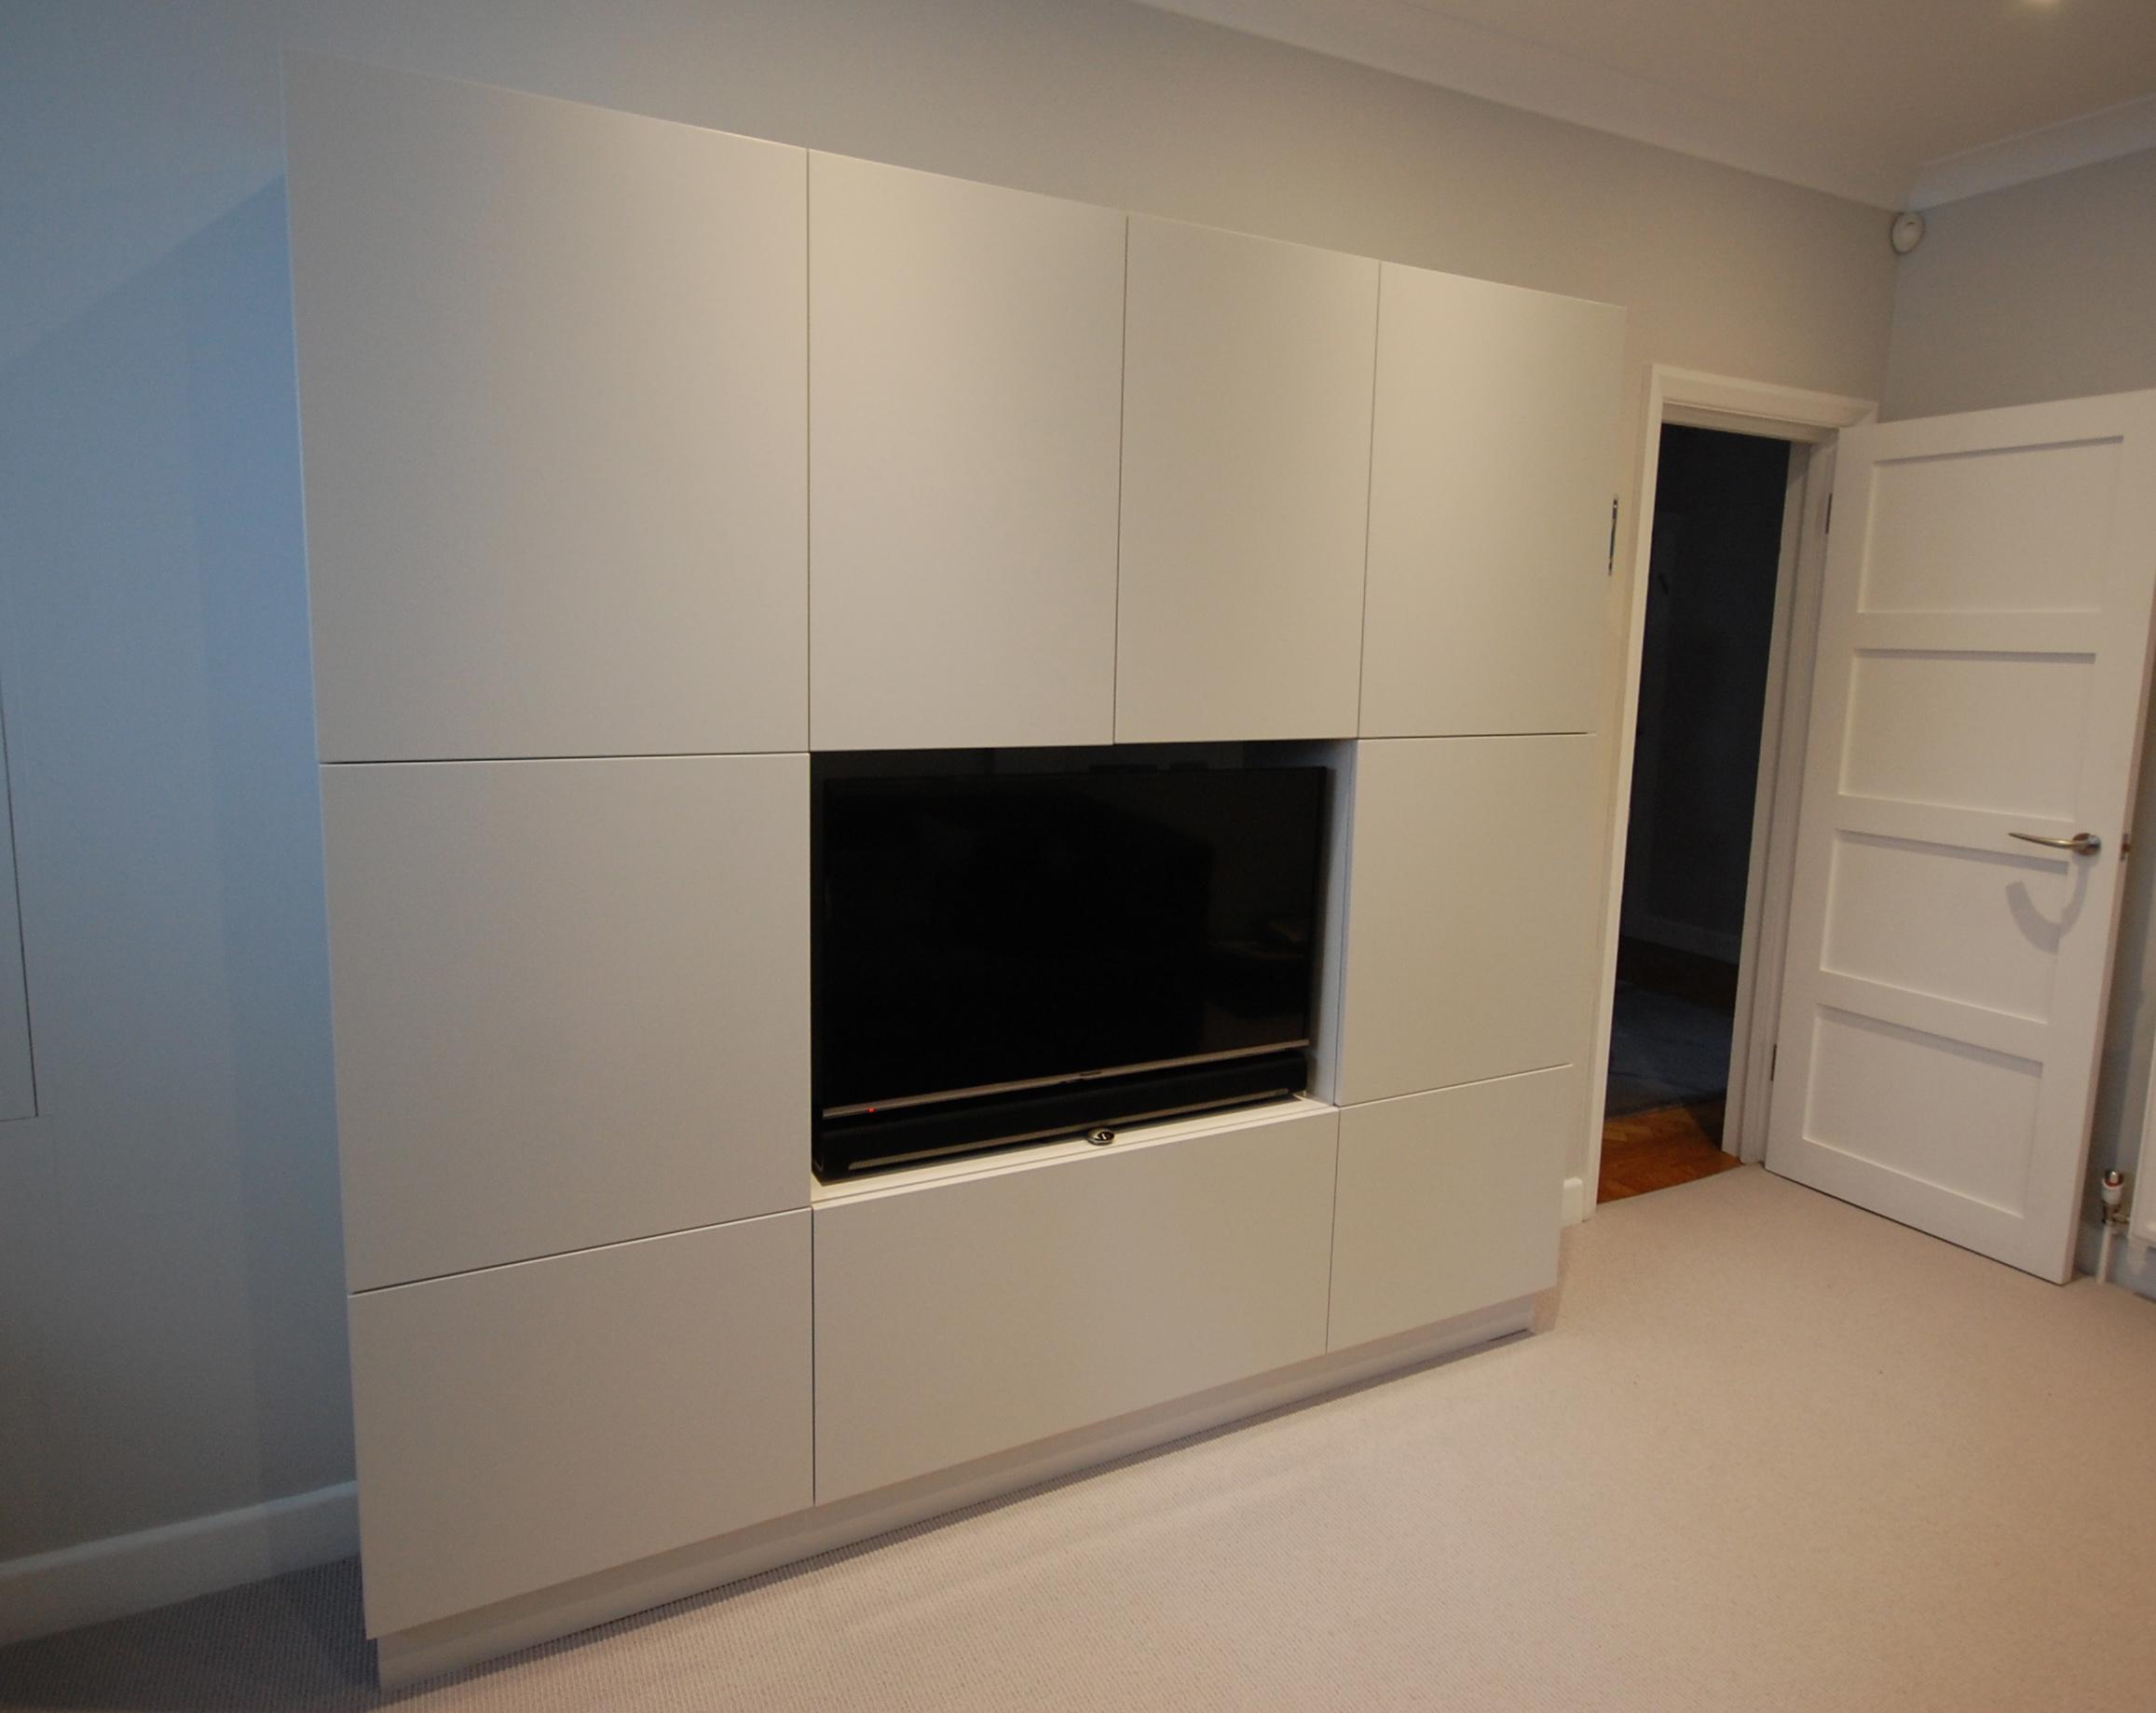 Grain_Bespoke_Furniture_White_Sprayed_TV_Unit.jpg